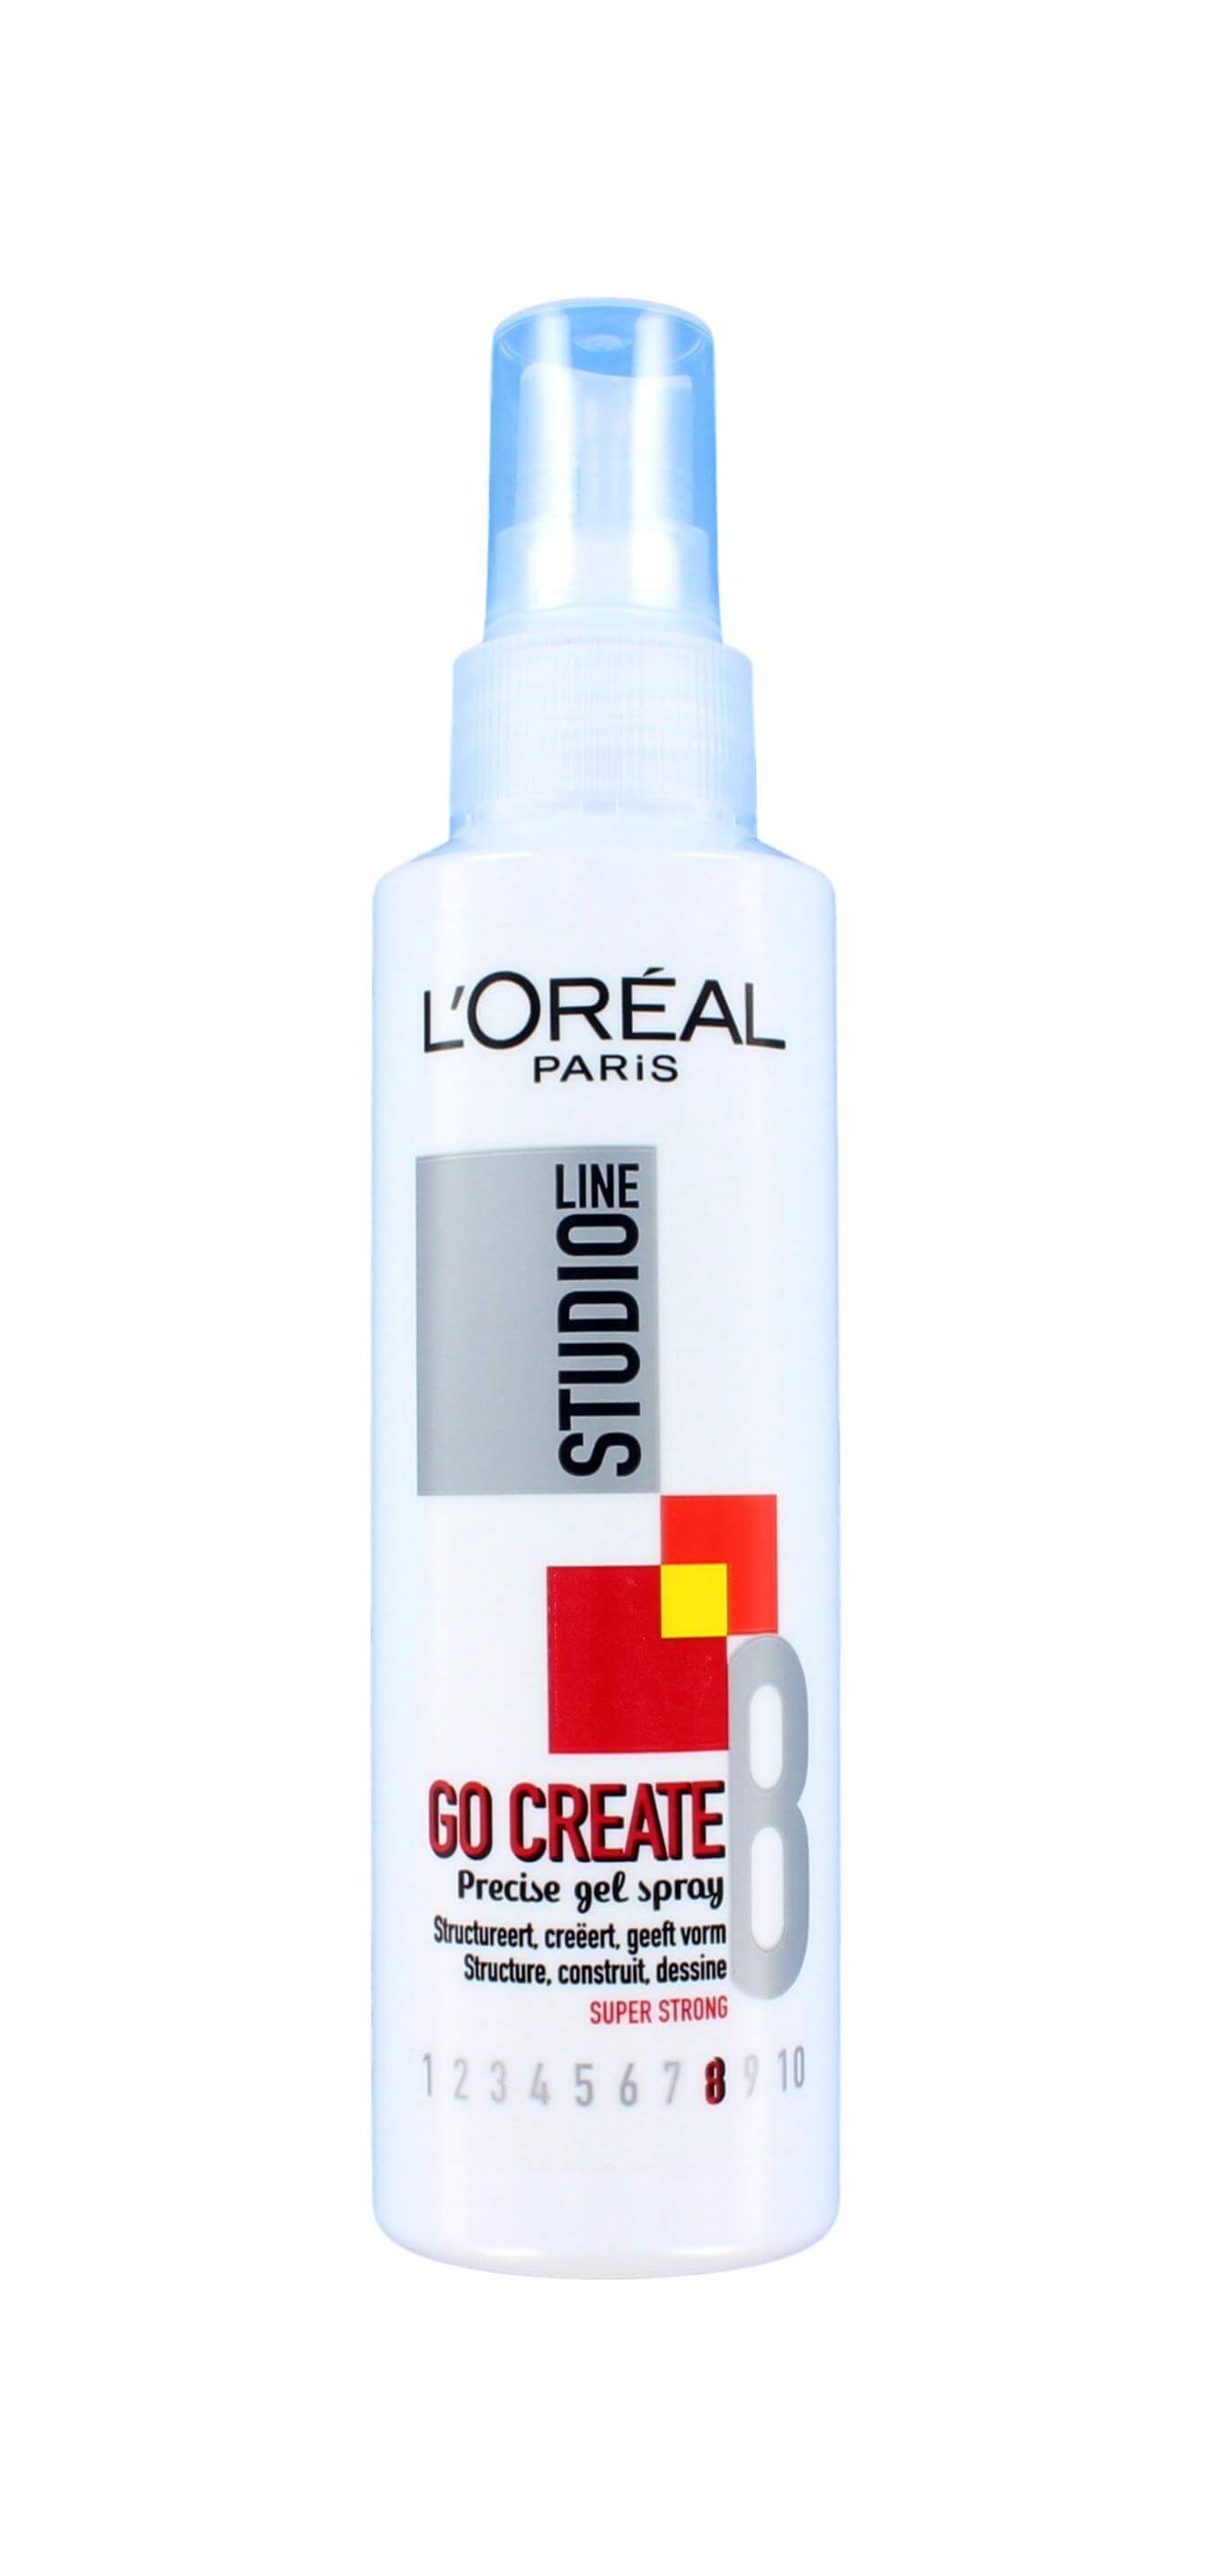 L'Oreal Studio Line Go Create Gel Spray Super Strong, 150 ml